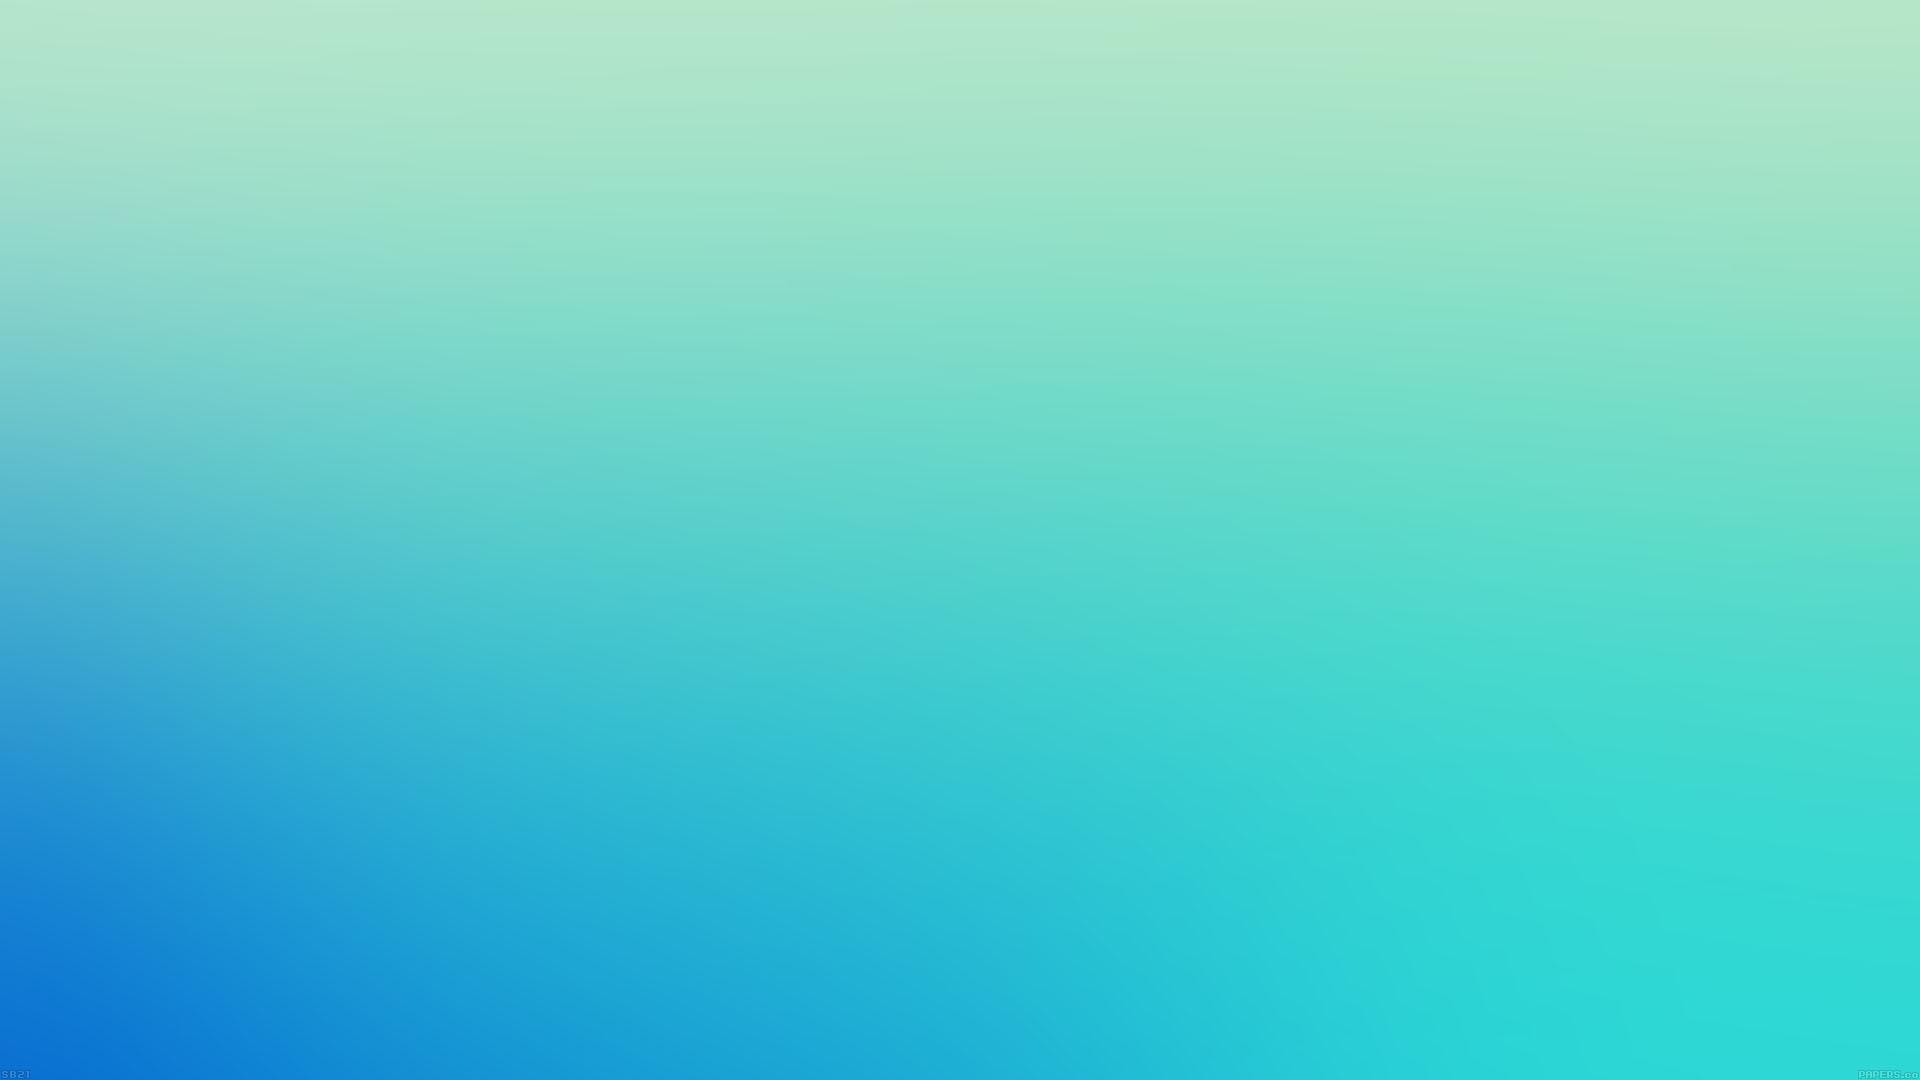 Minimalist Wallpaper Iphone X Wallpaper For Desktop Laptop Sb21 Wallpaper Gradient